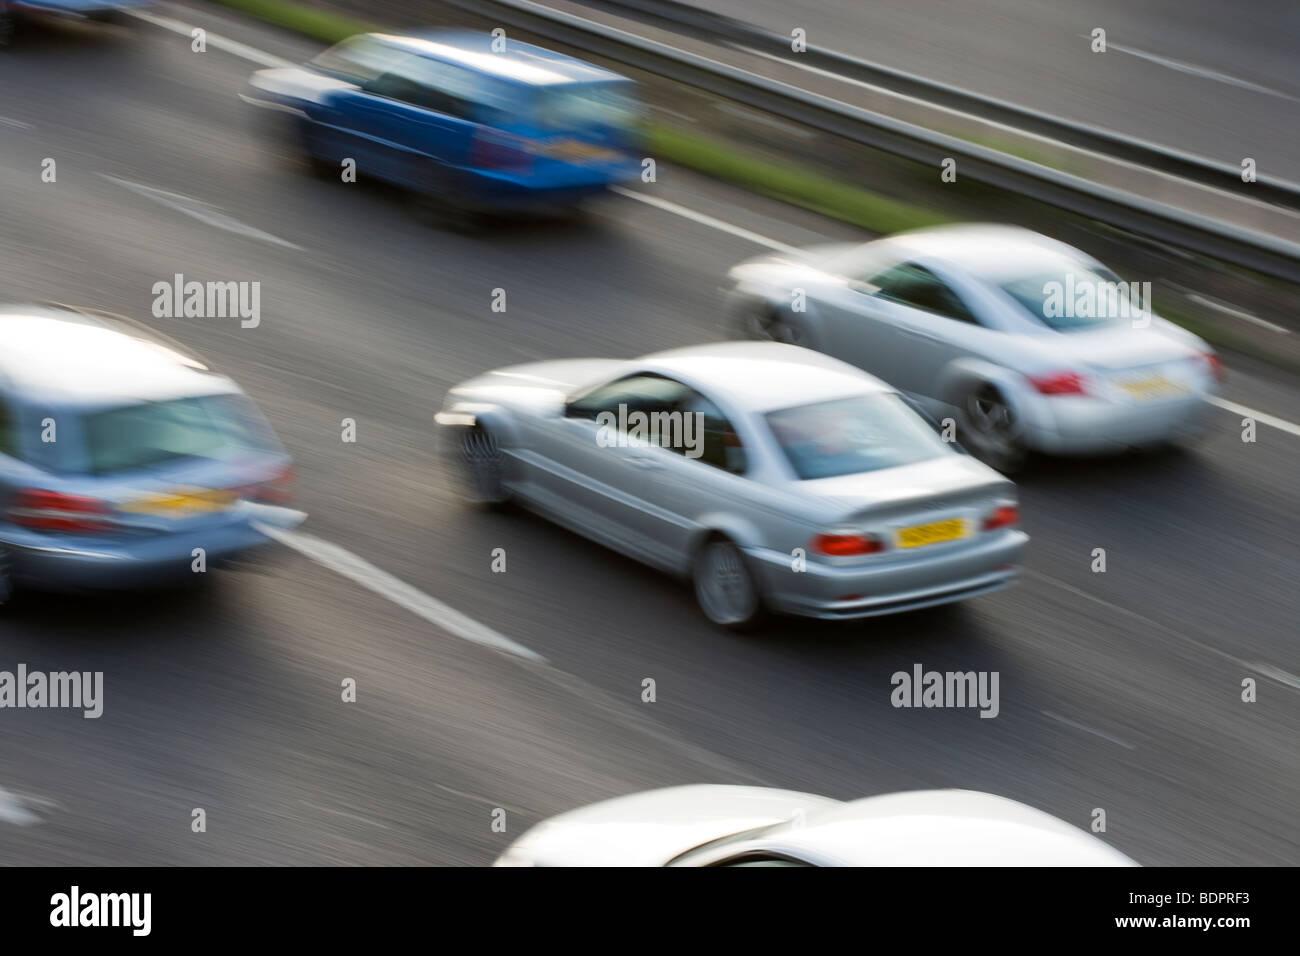 motorway photos motorway images alamy. Black Bedroom Furniture Sets. Home Design Ideas